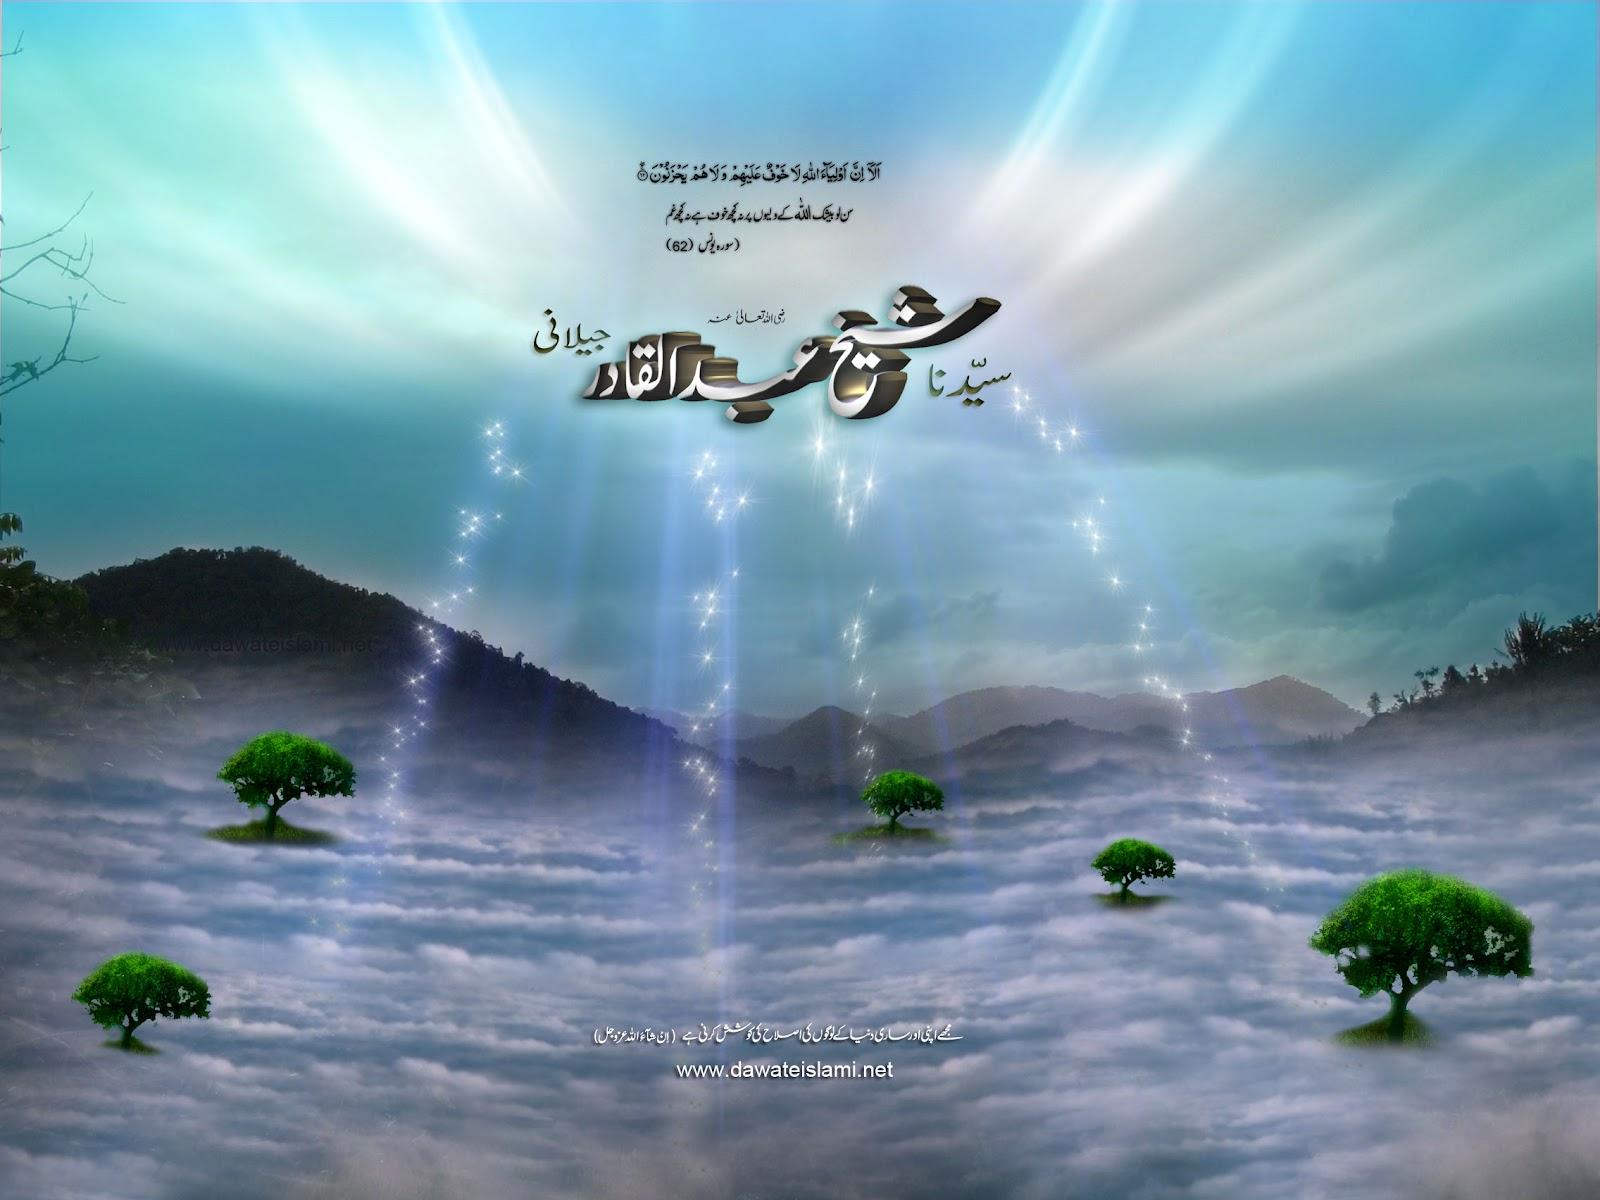 islami wallpaper: Ghous e azam wallpapers